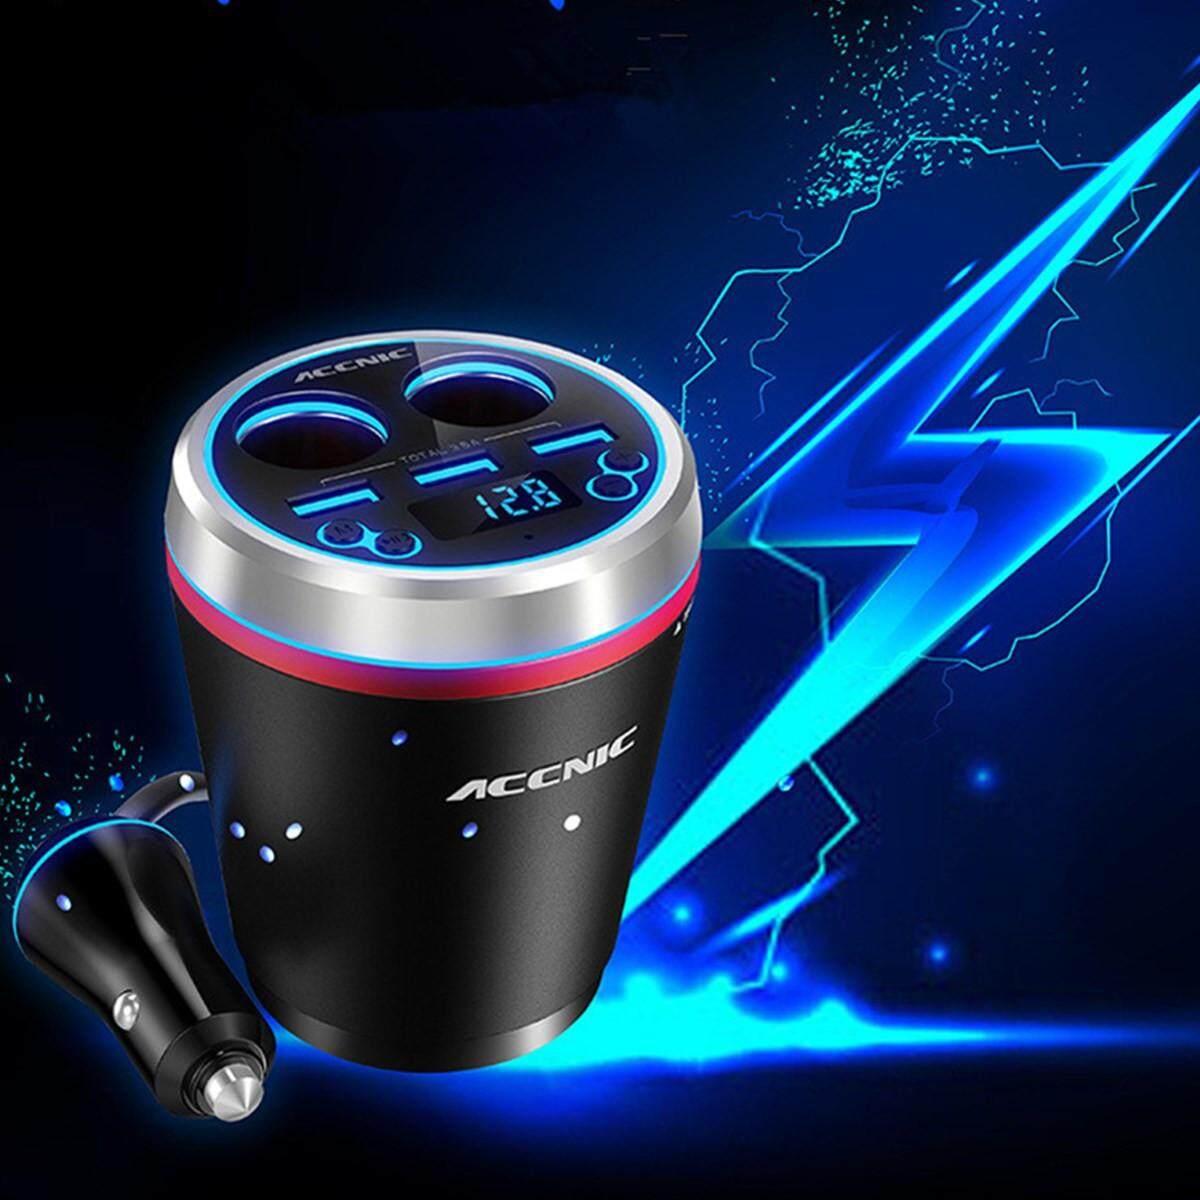 3 Ports USB Charger FM Transmitter Radio MP3 Player bluetooth Car Kit Handsfree #black - intl